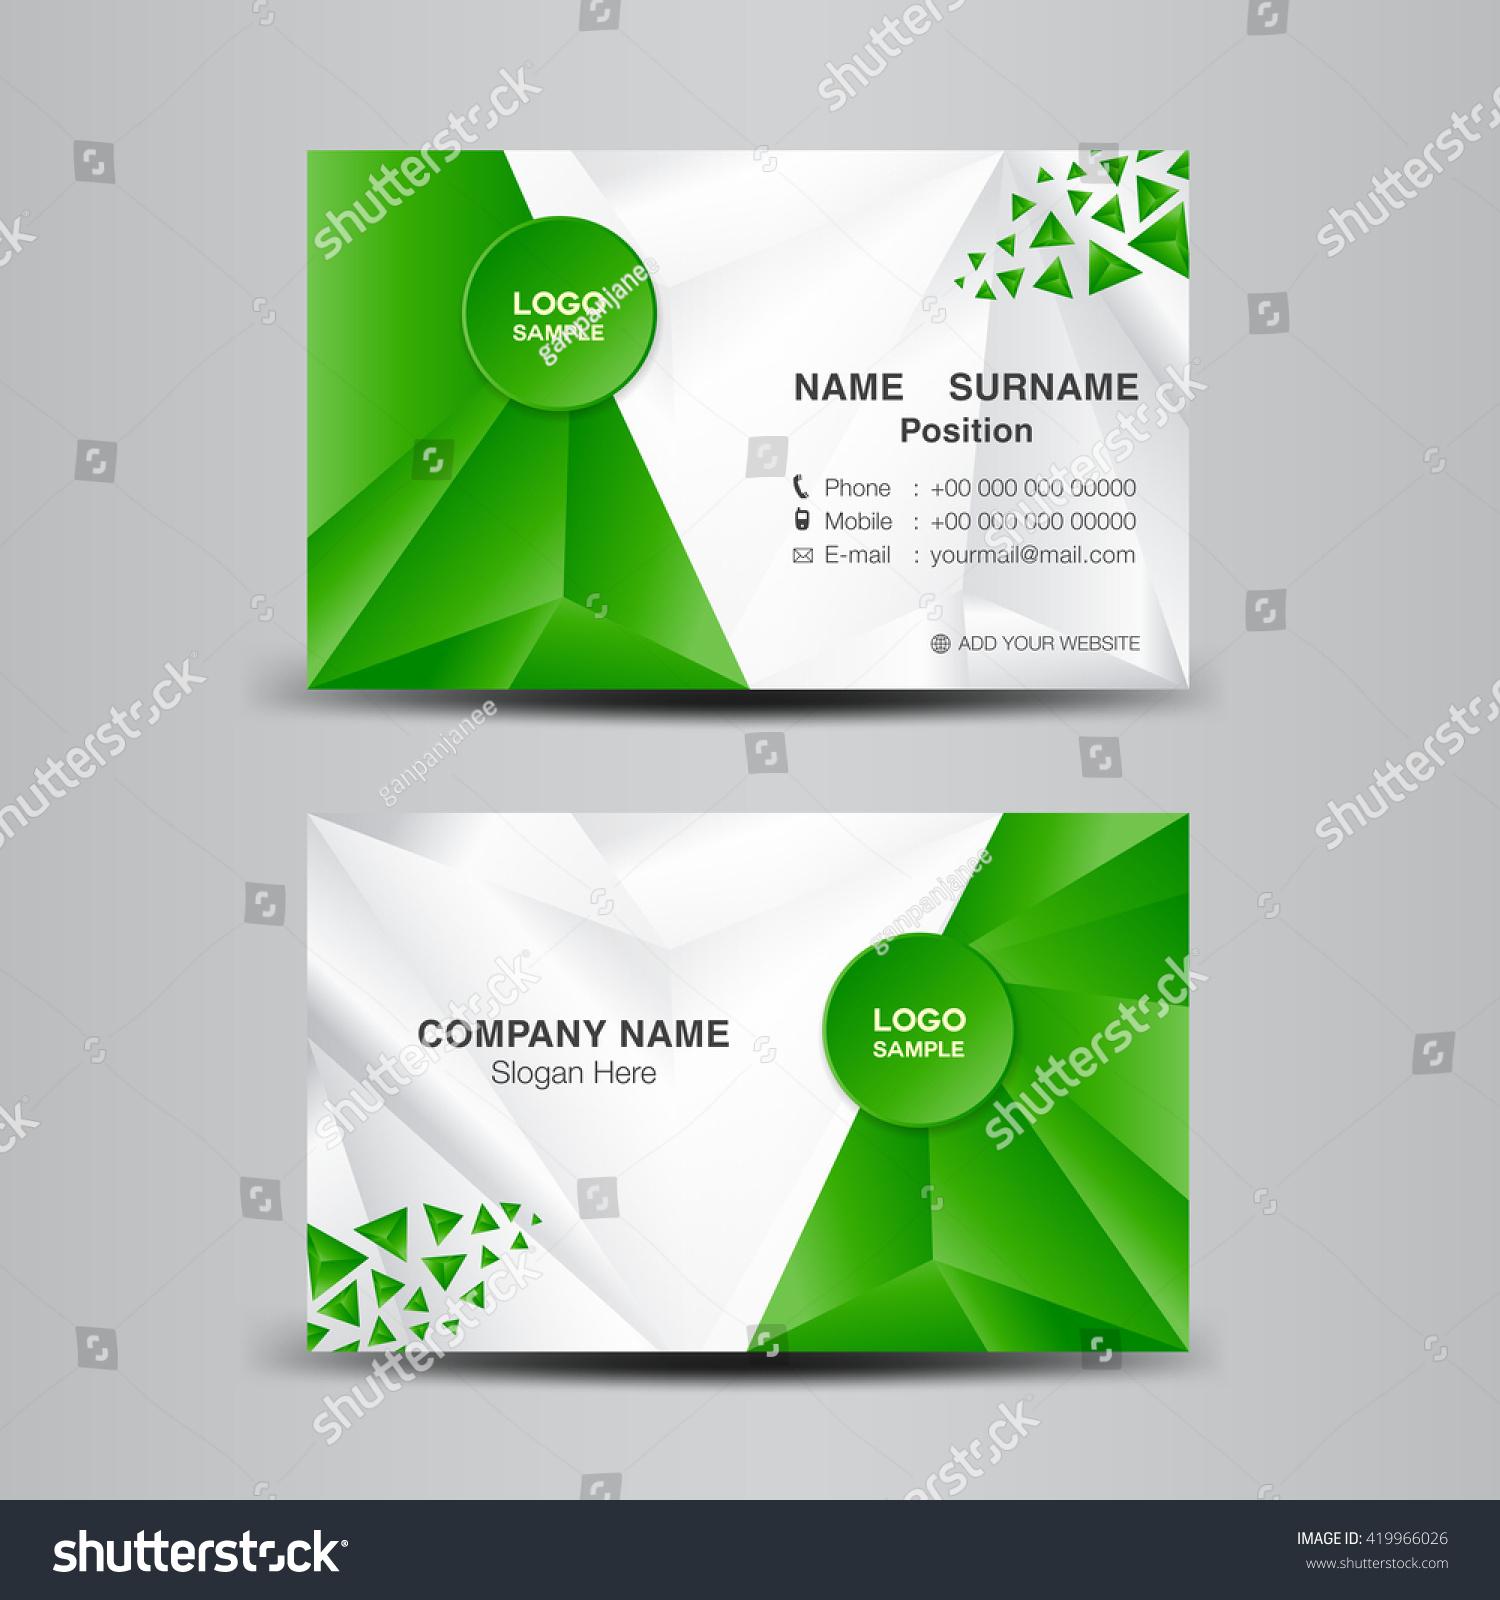 Business Card Template Vector Illustrationgreen Polygon Stock Vector ...